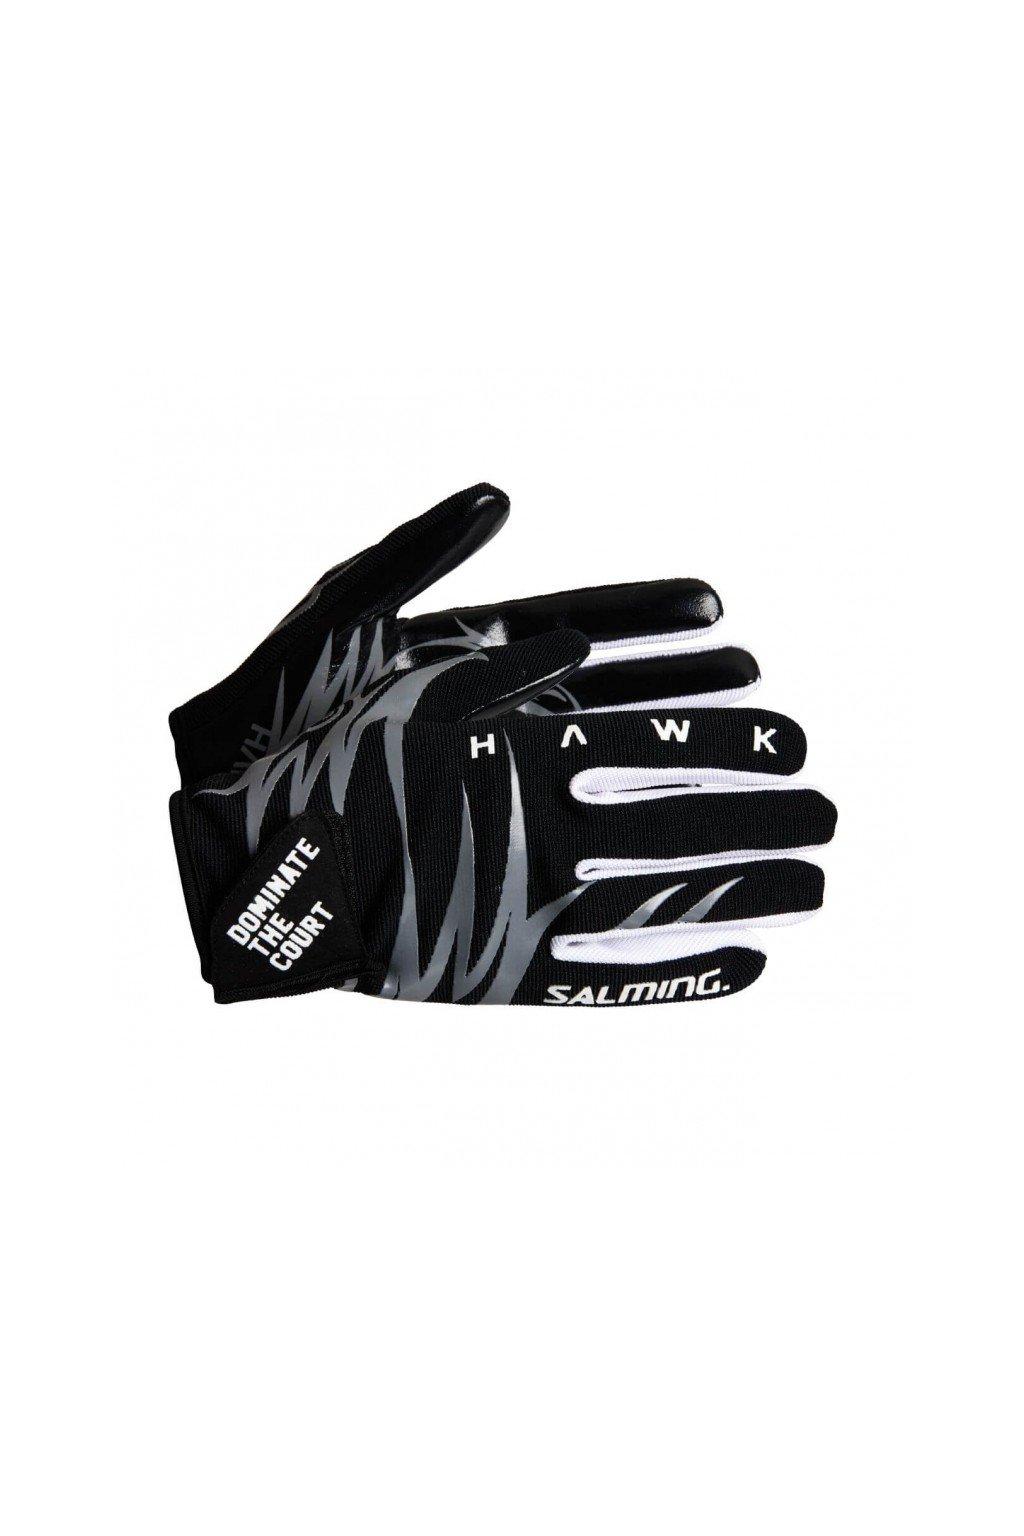 SALMING Hawk Goalie Gloves Black/Grey